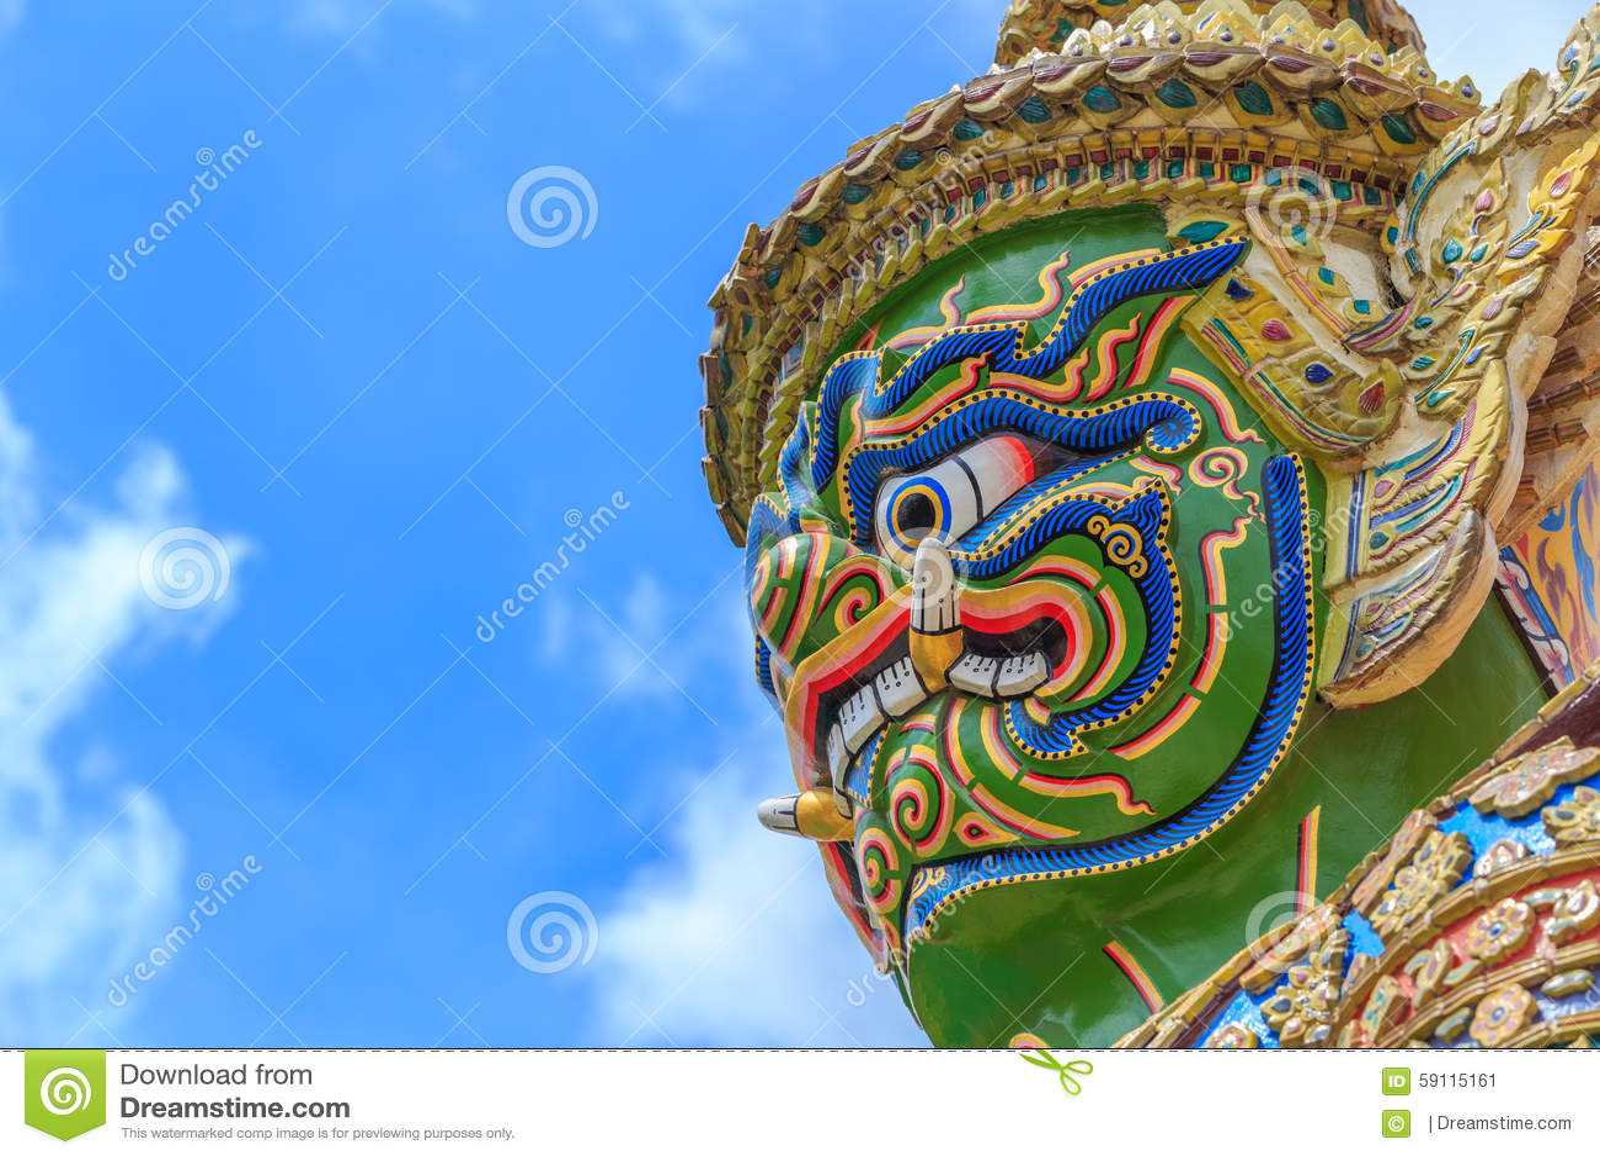 Temple of The Emerald Buddha or Wat Phra Kaew, Grand Palace, Bangkok, Thailand